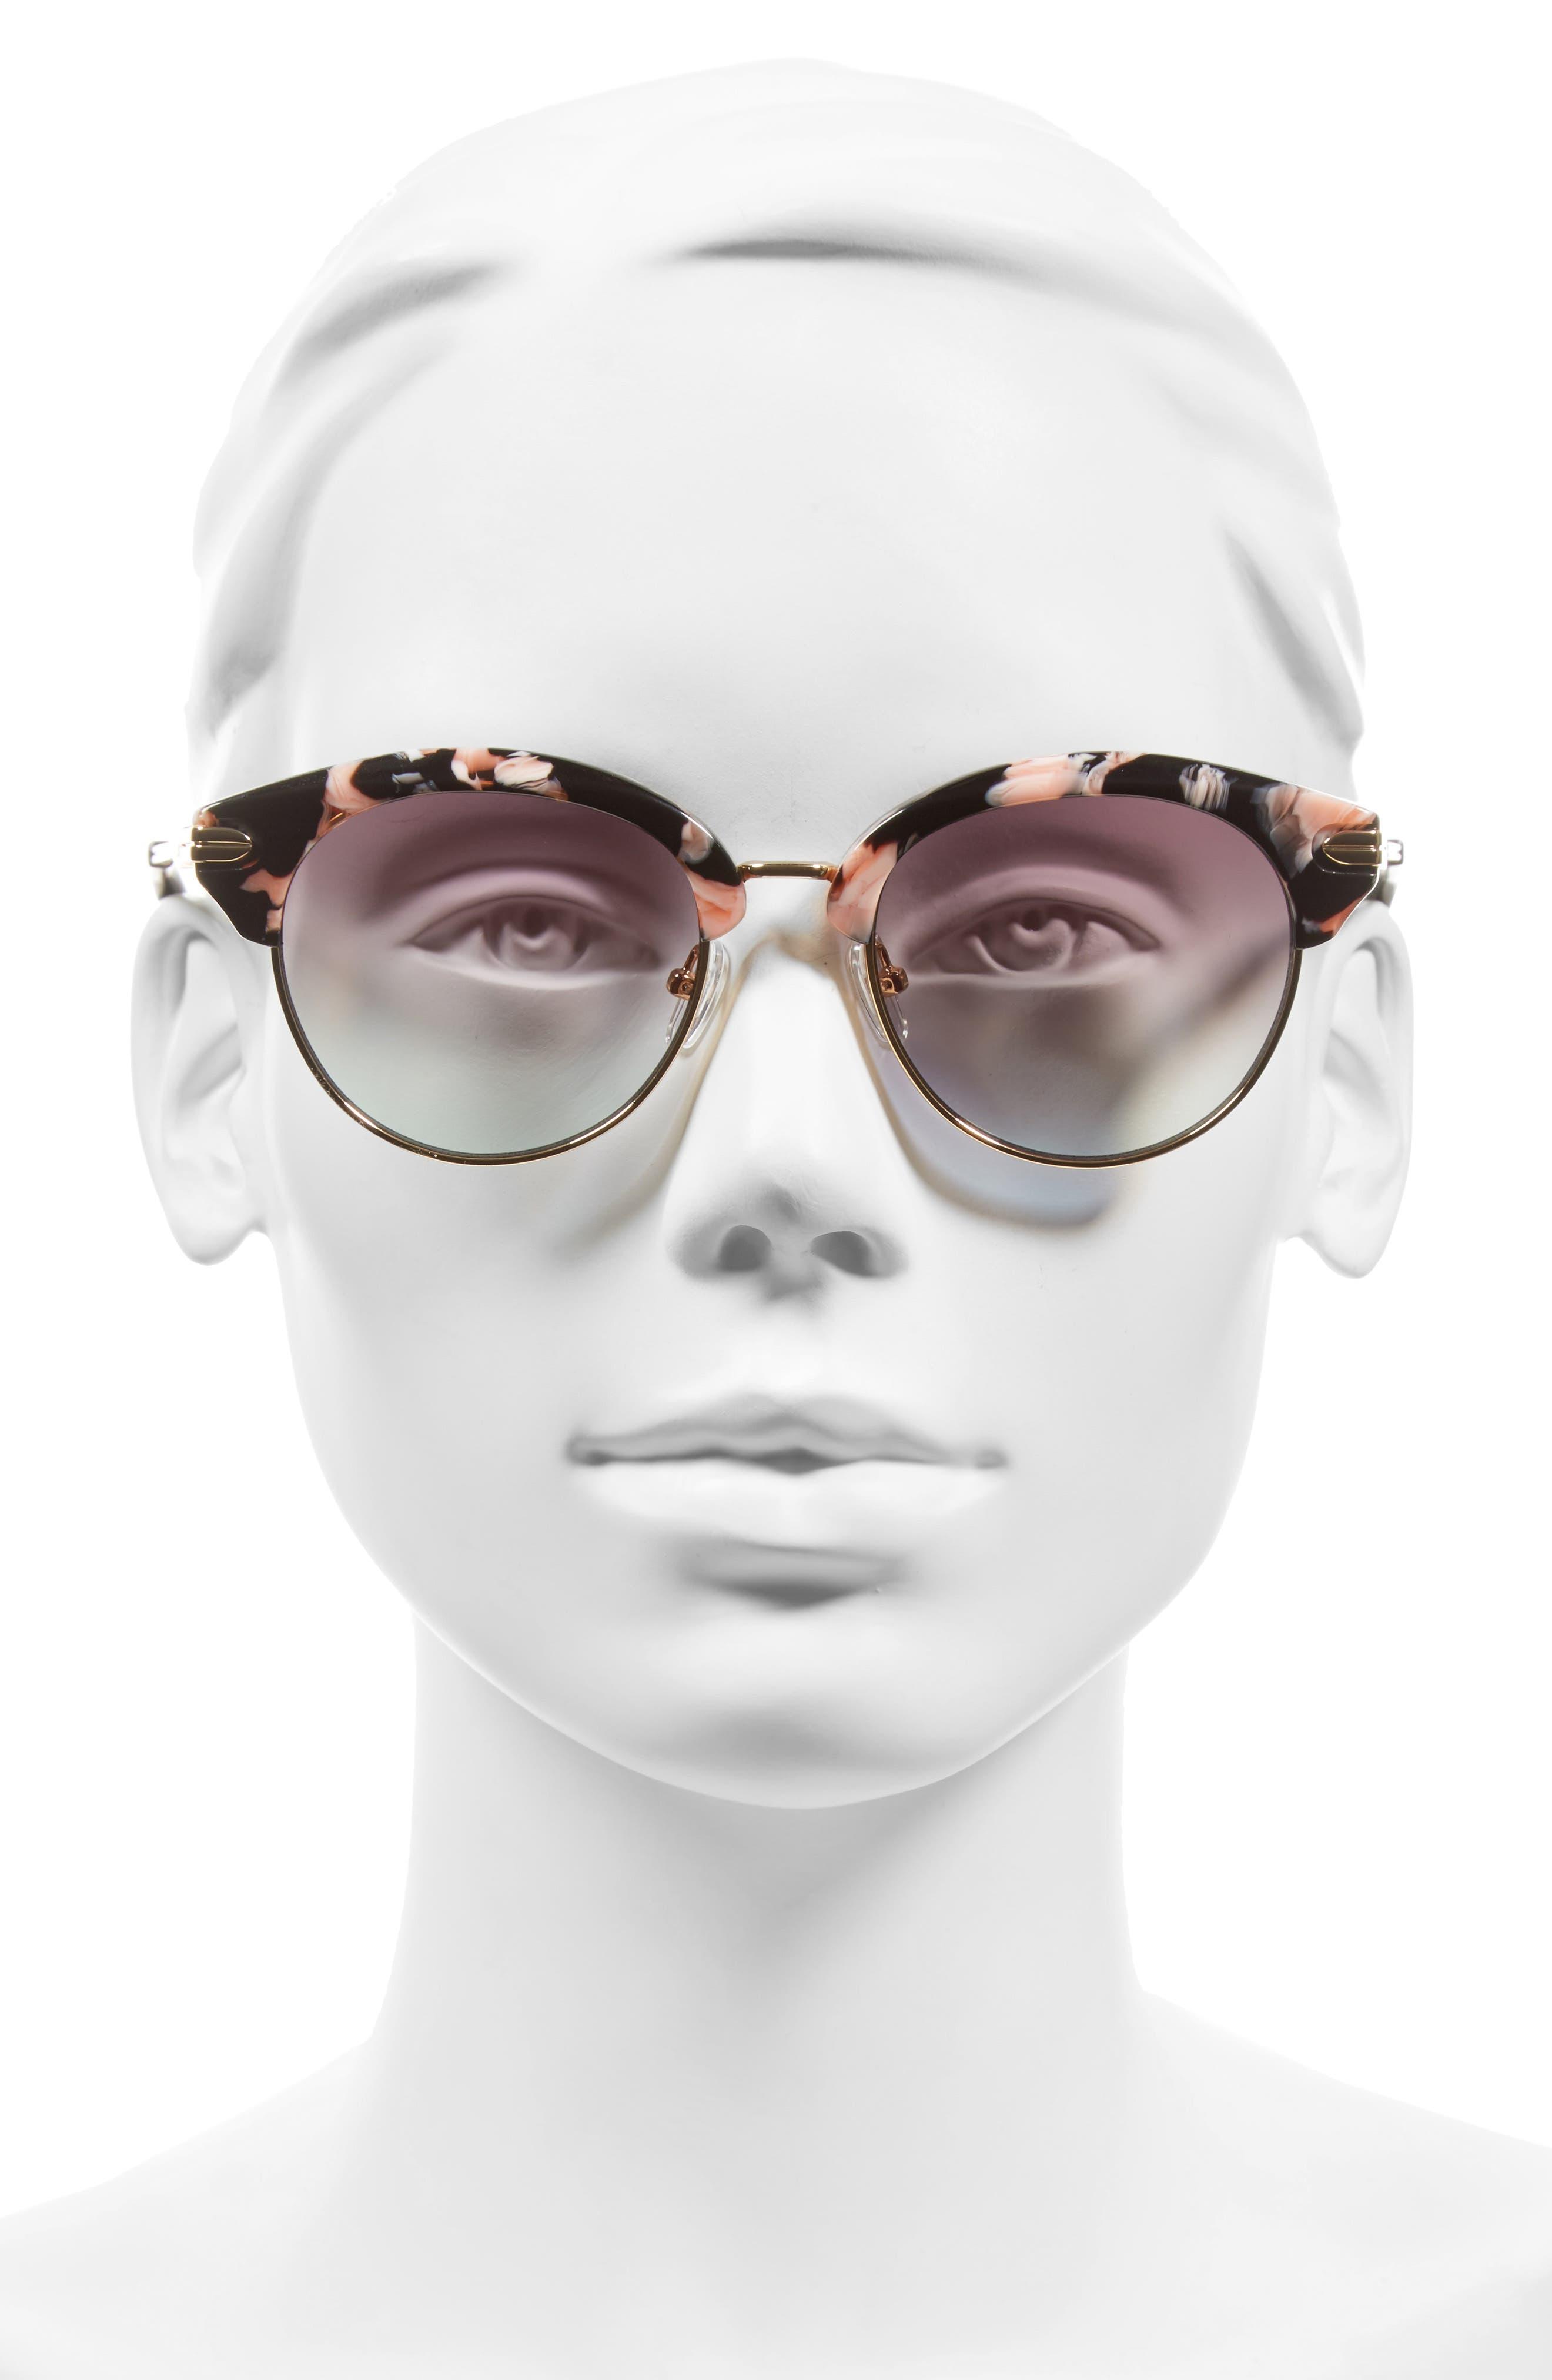 Bellevue 50mm Mirrored Sunglasses,                             Alternate thumbnail 4, color,                             Rose Tort/ Magenta Mirror